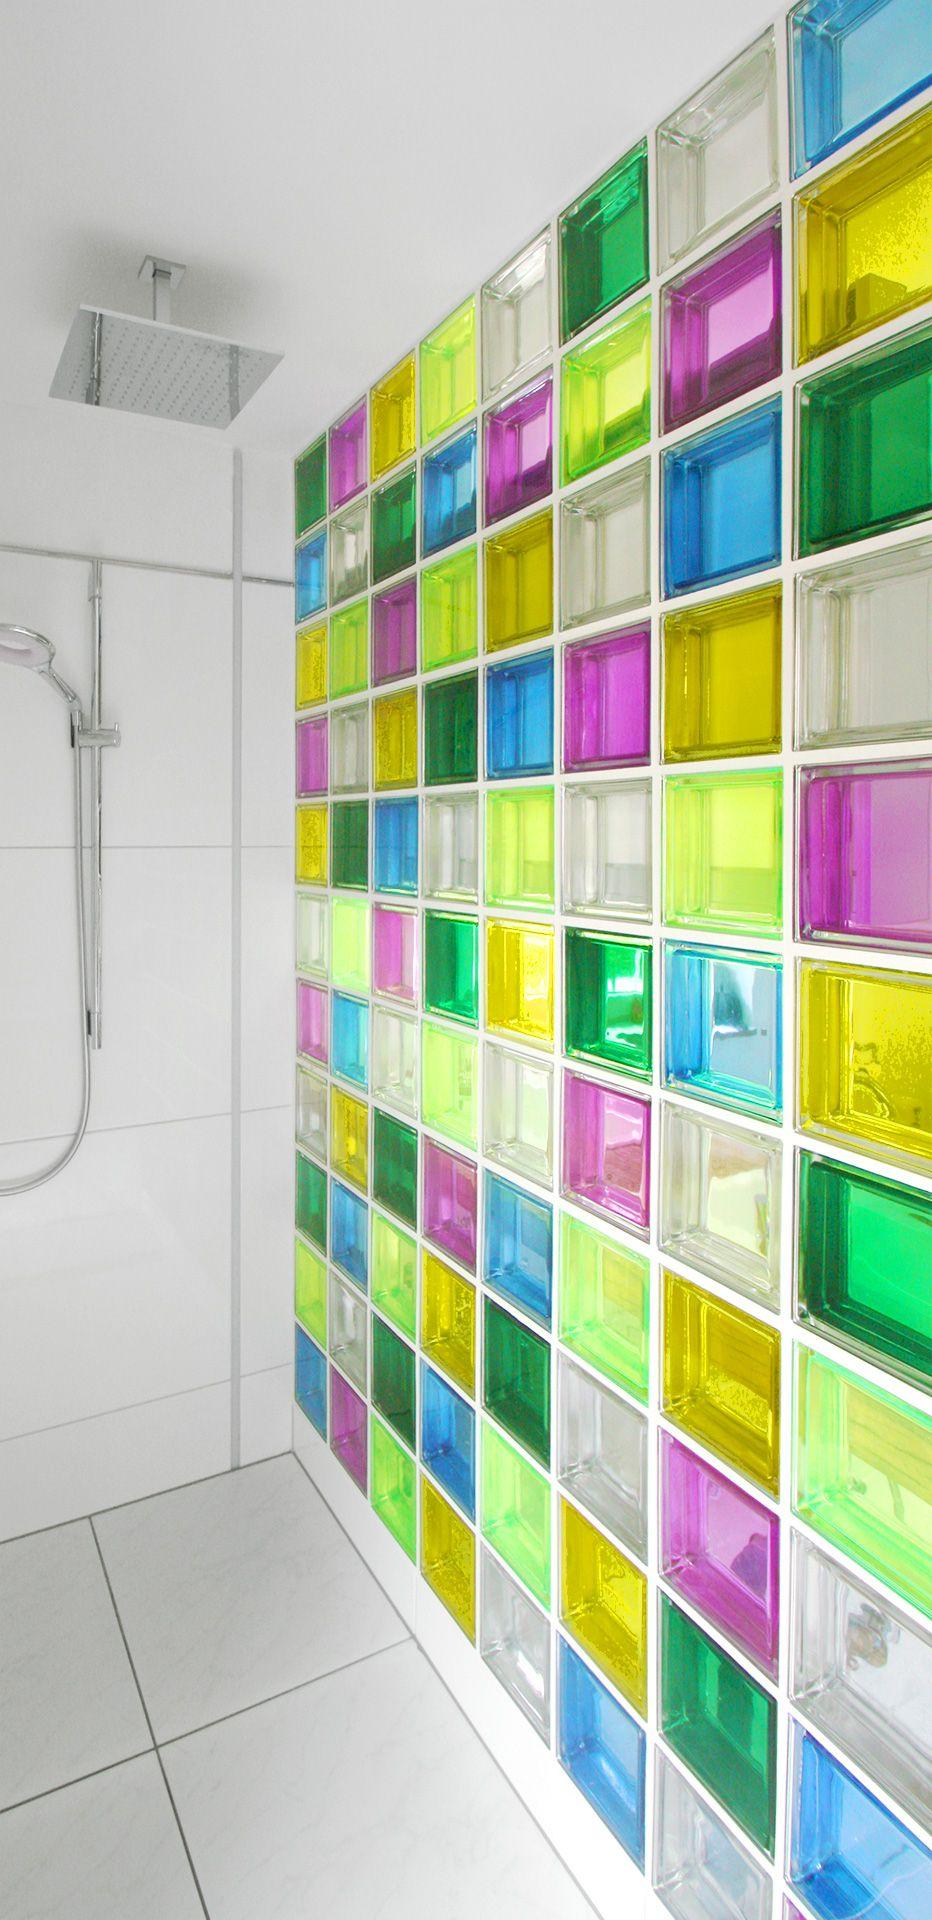 glasbausteine tritschler glasundformtritschler glasundform home pinterest. Black Bedroom Furniture Sets. Home Design Ideas